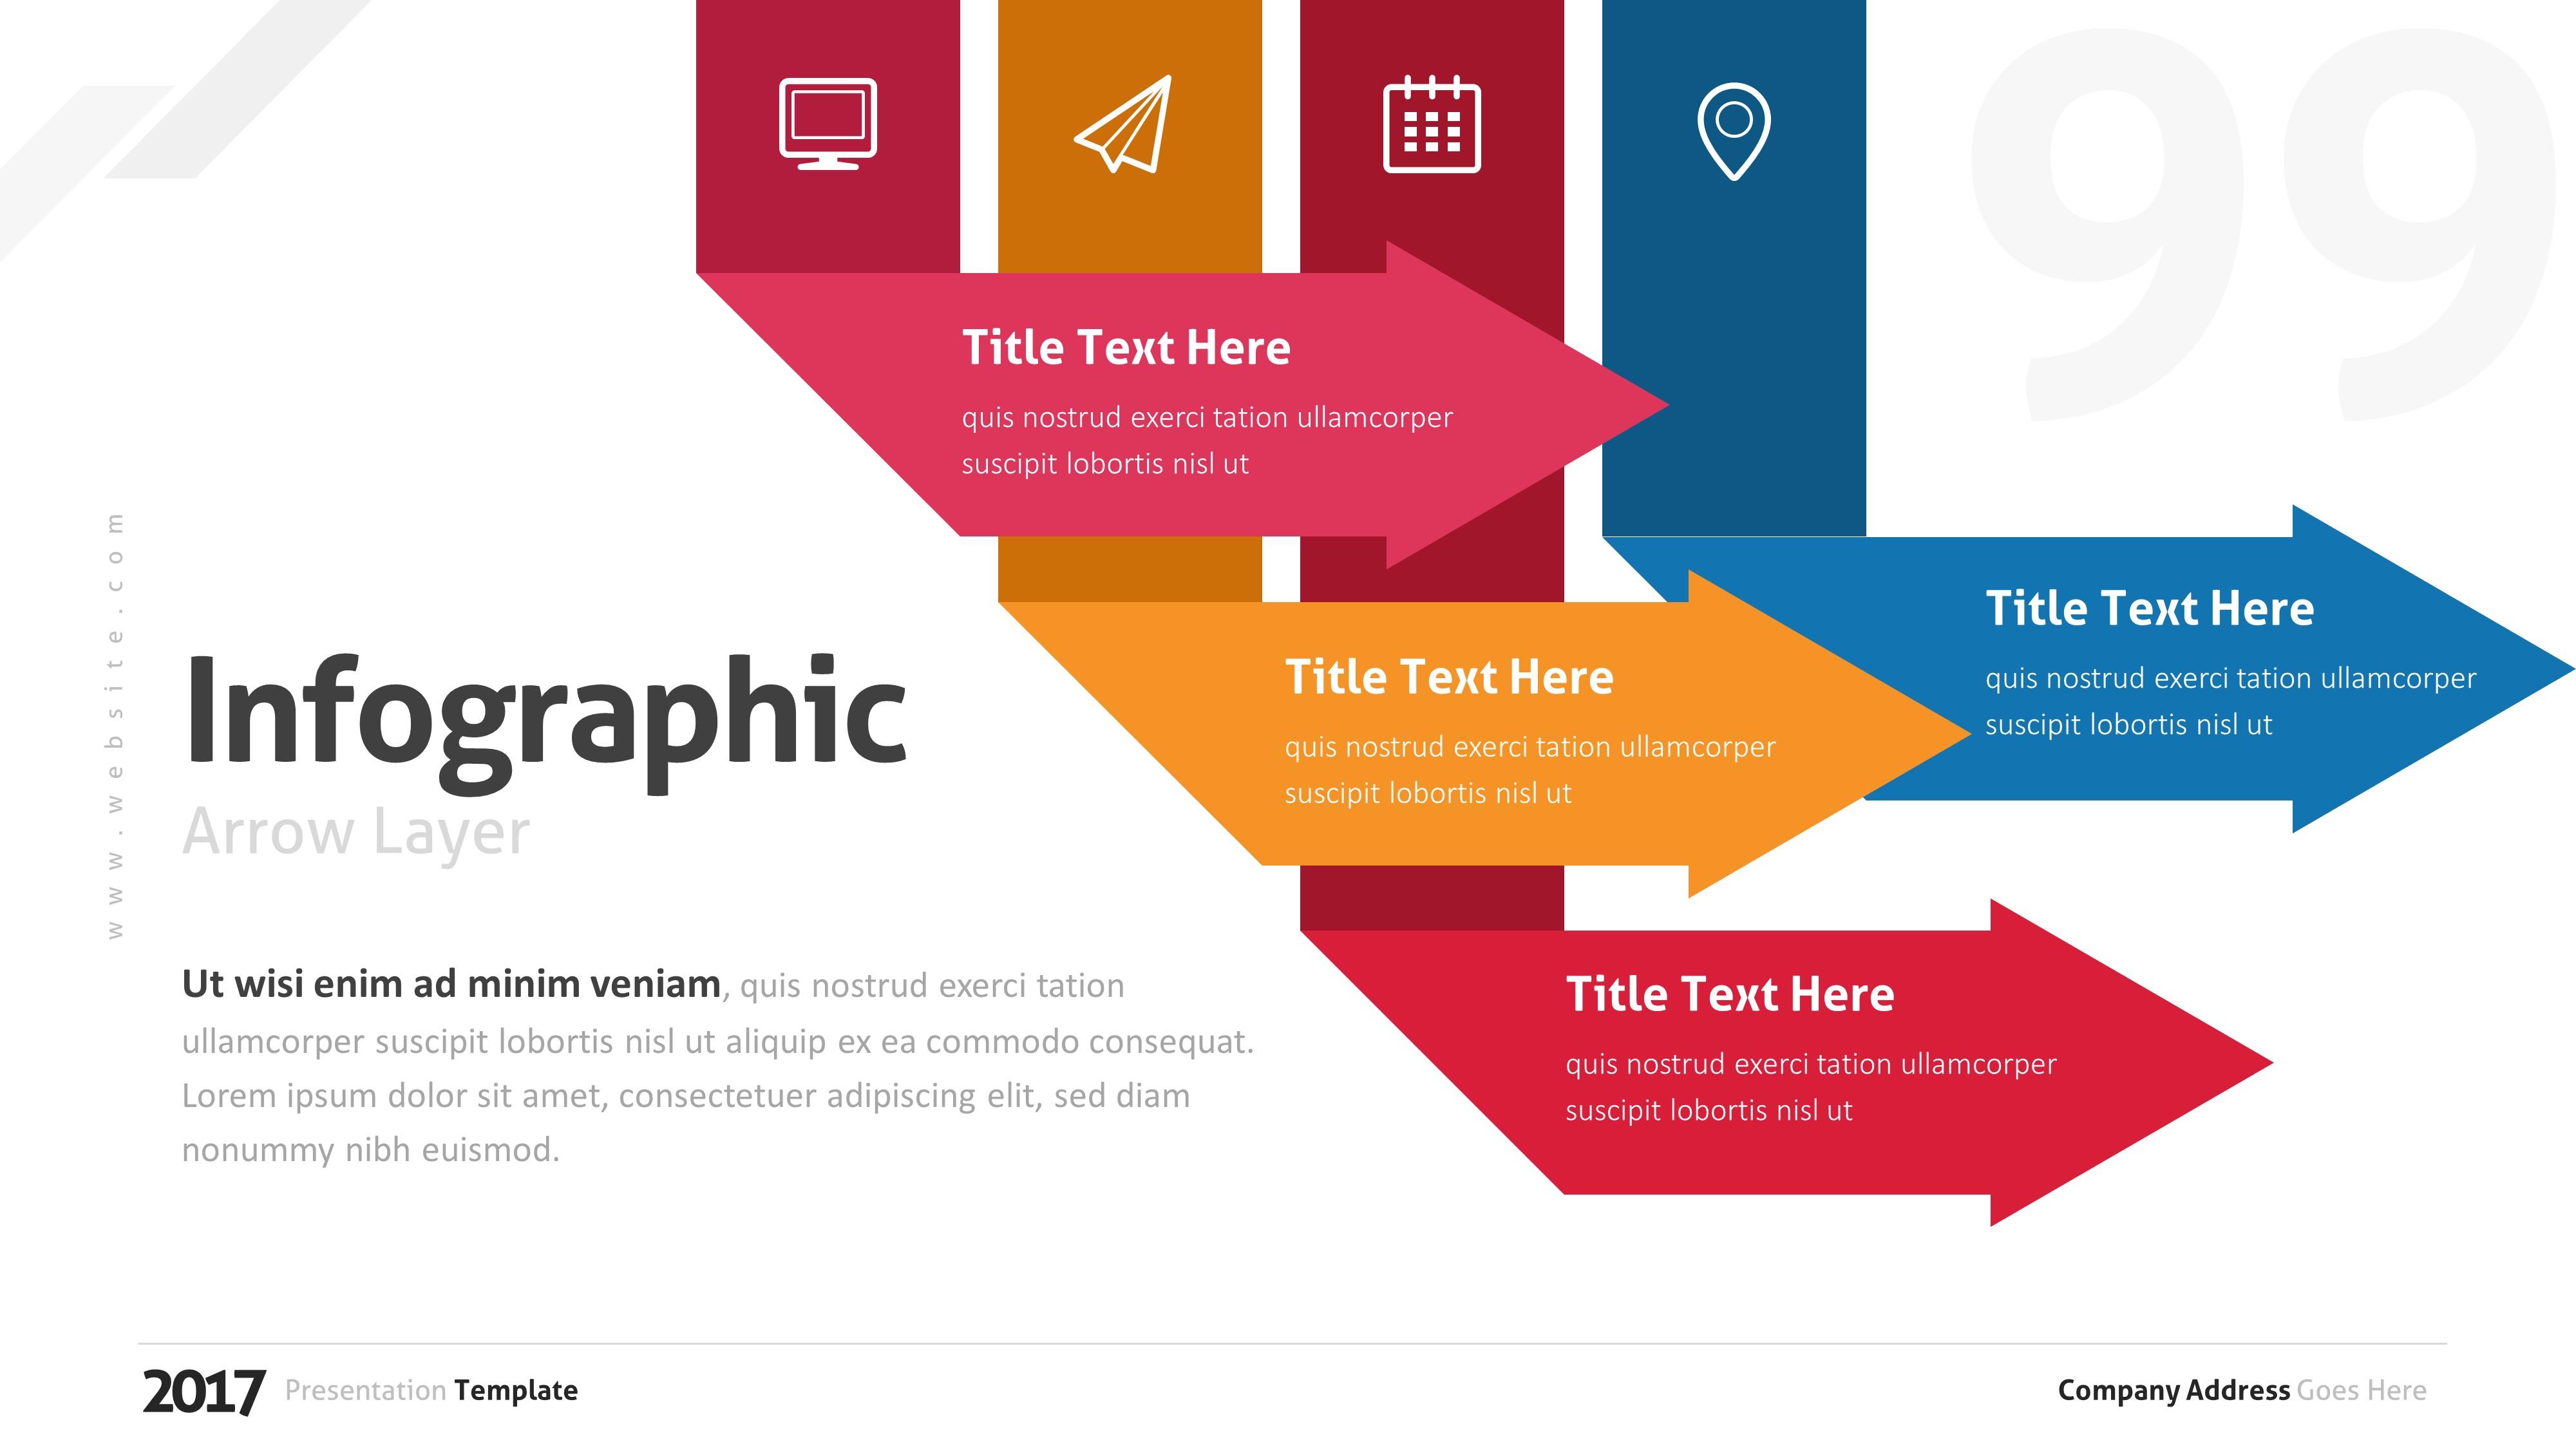 2017 project presentation template by brandearth graphicriver image set v19 update26g toneelgroepblik Gallery